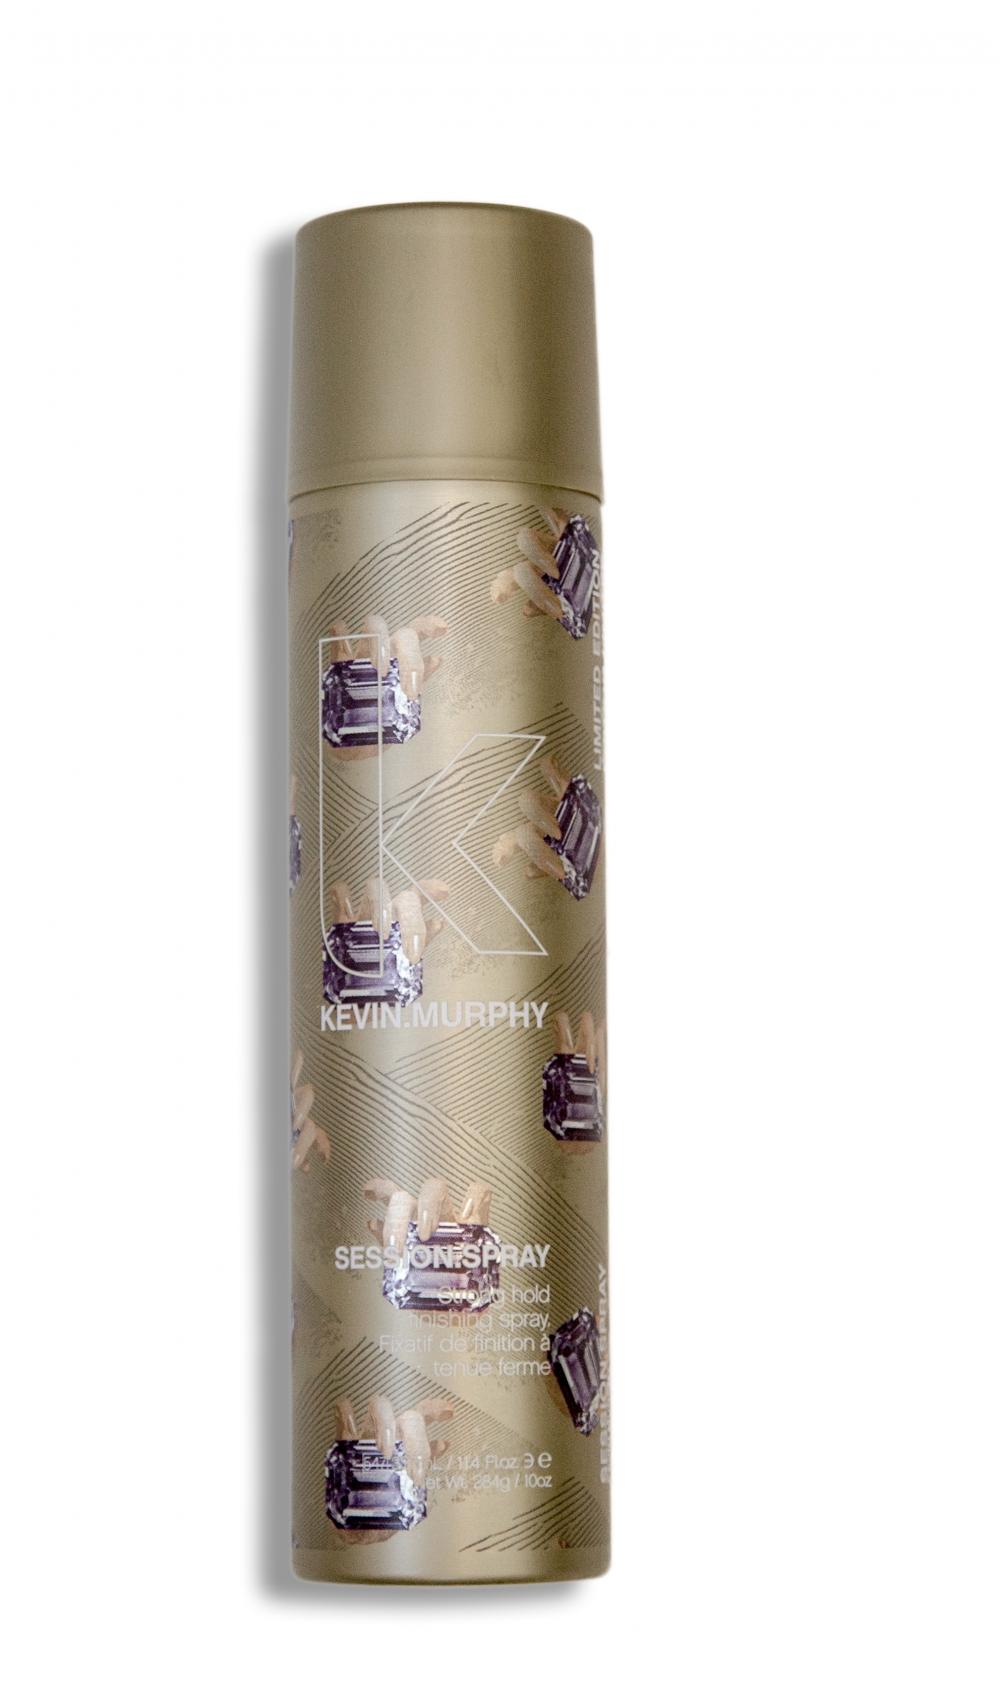 Fashion Week Inspires Limited Edition Spray